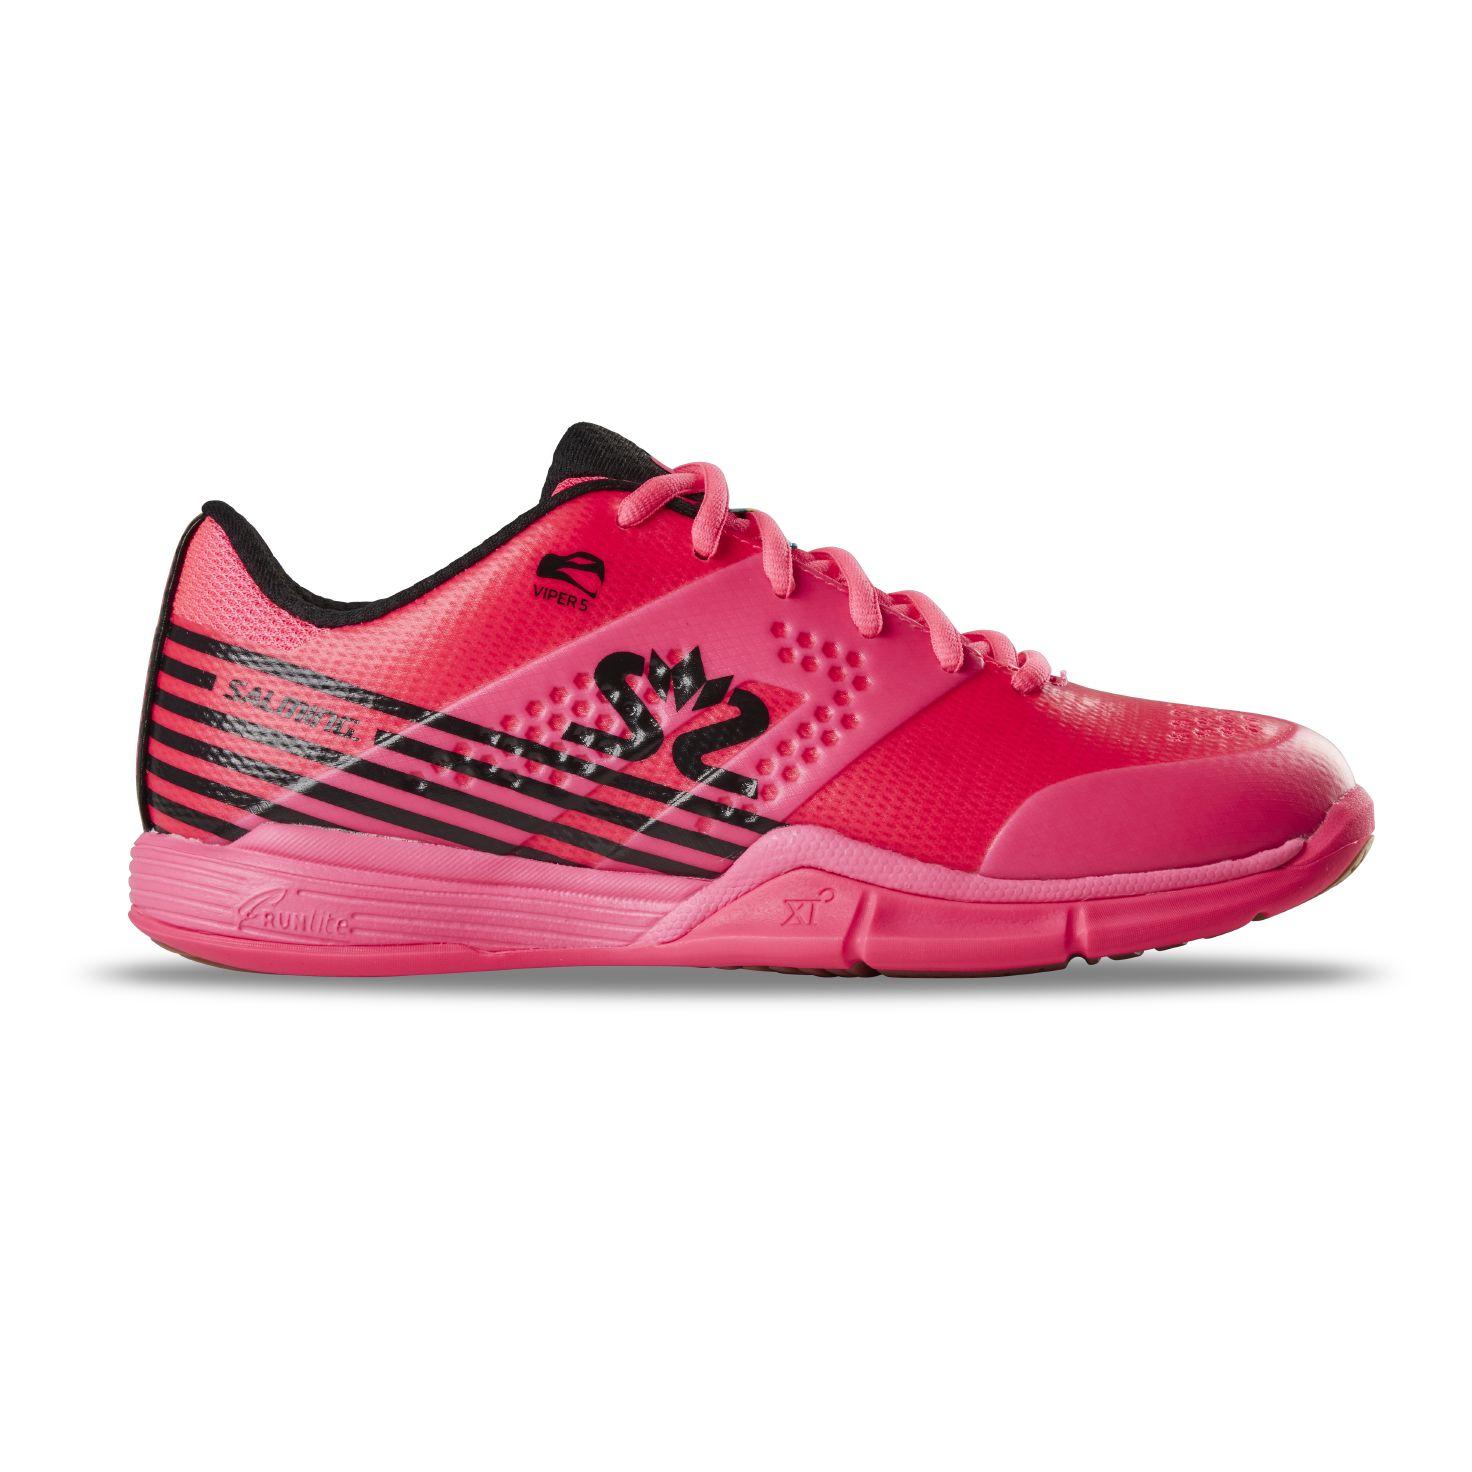 Salming Viper 5 Shoe Women Pink/Black 7 UK - 40 2/3 EUR - 26 cm